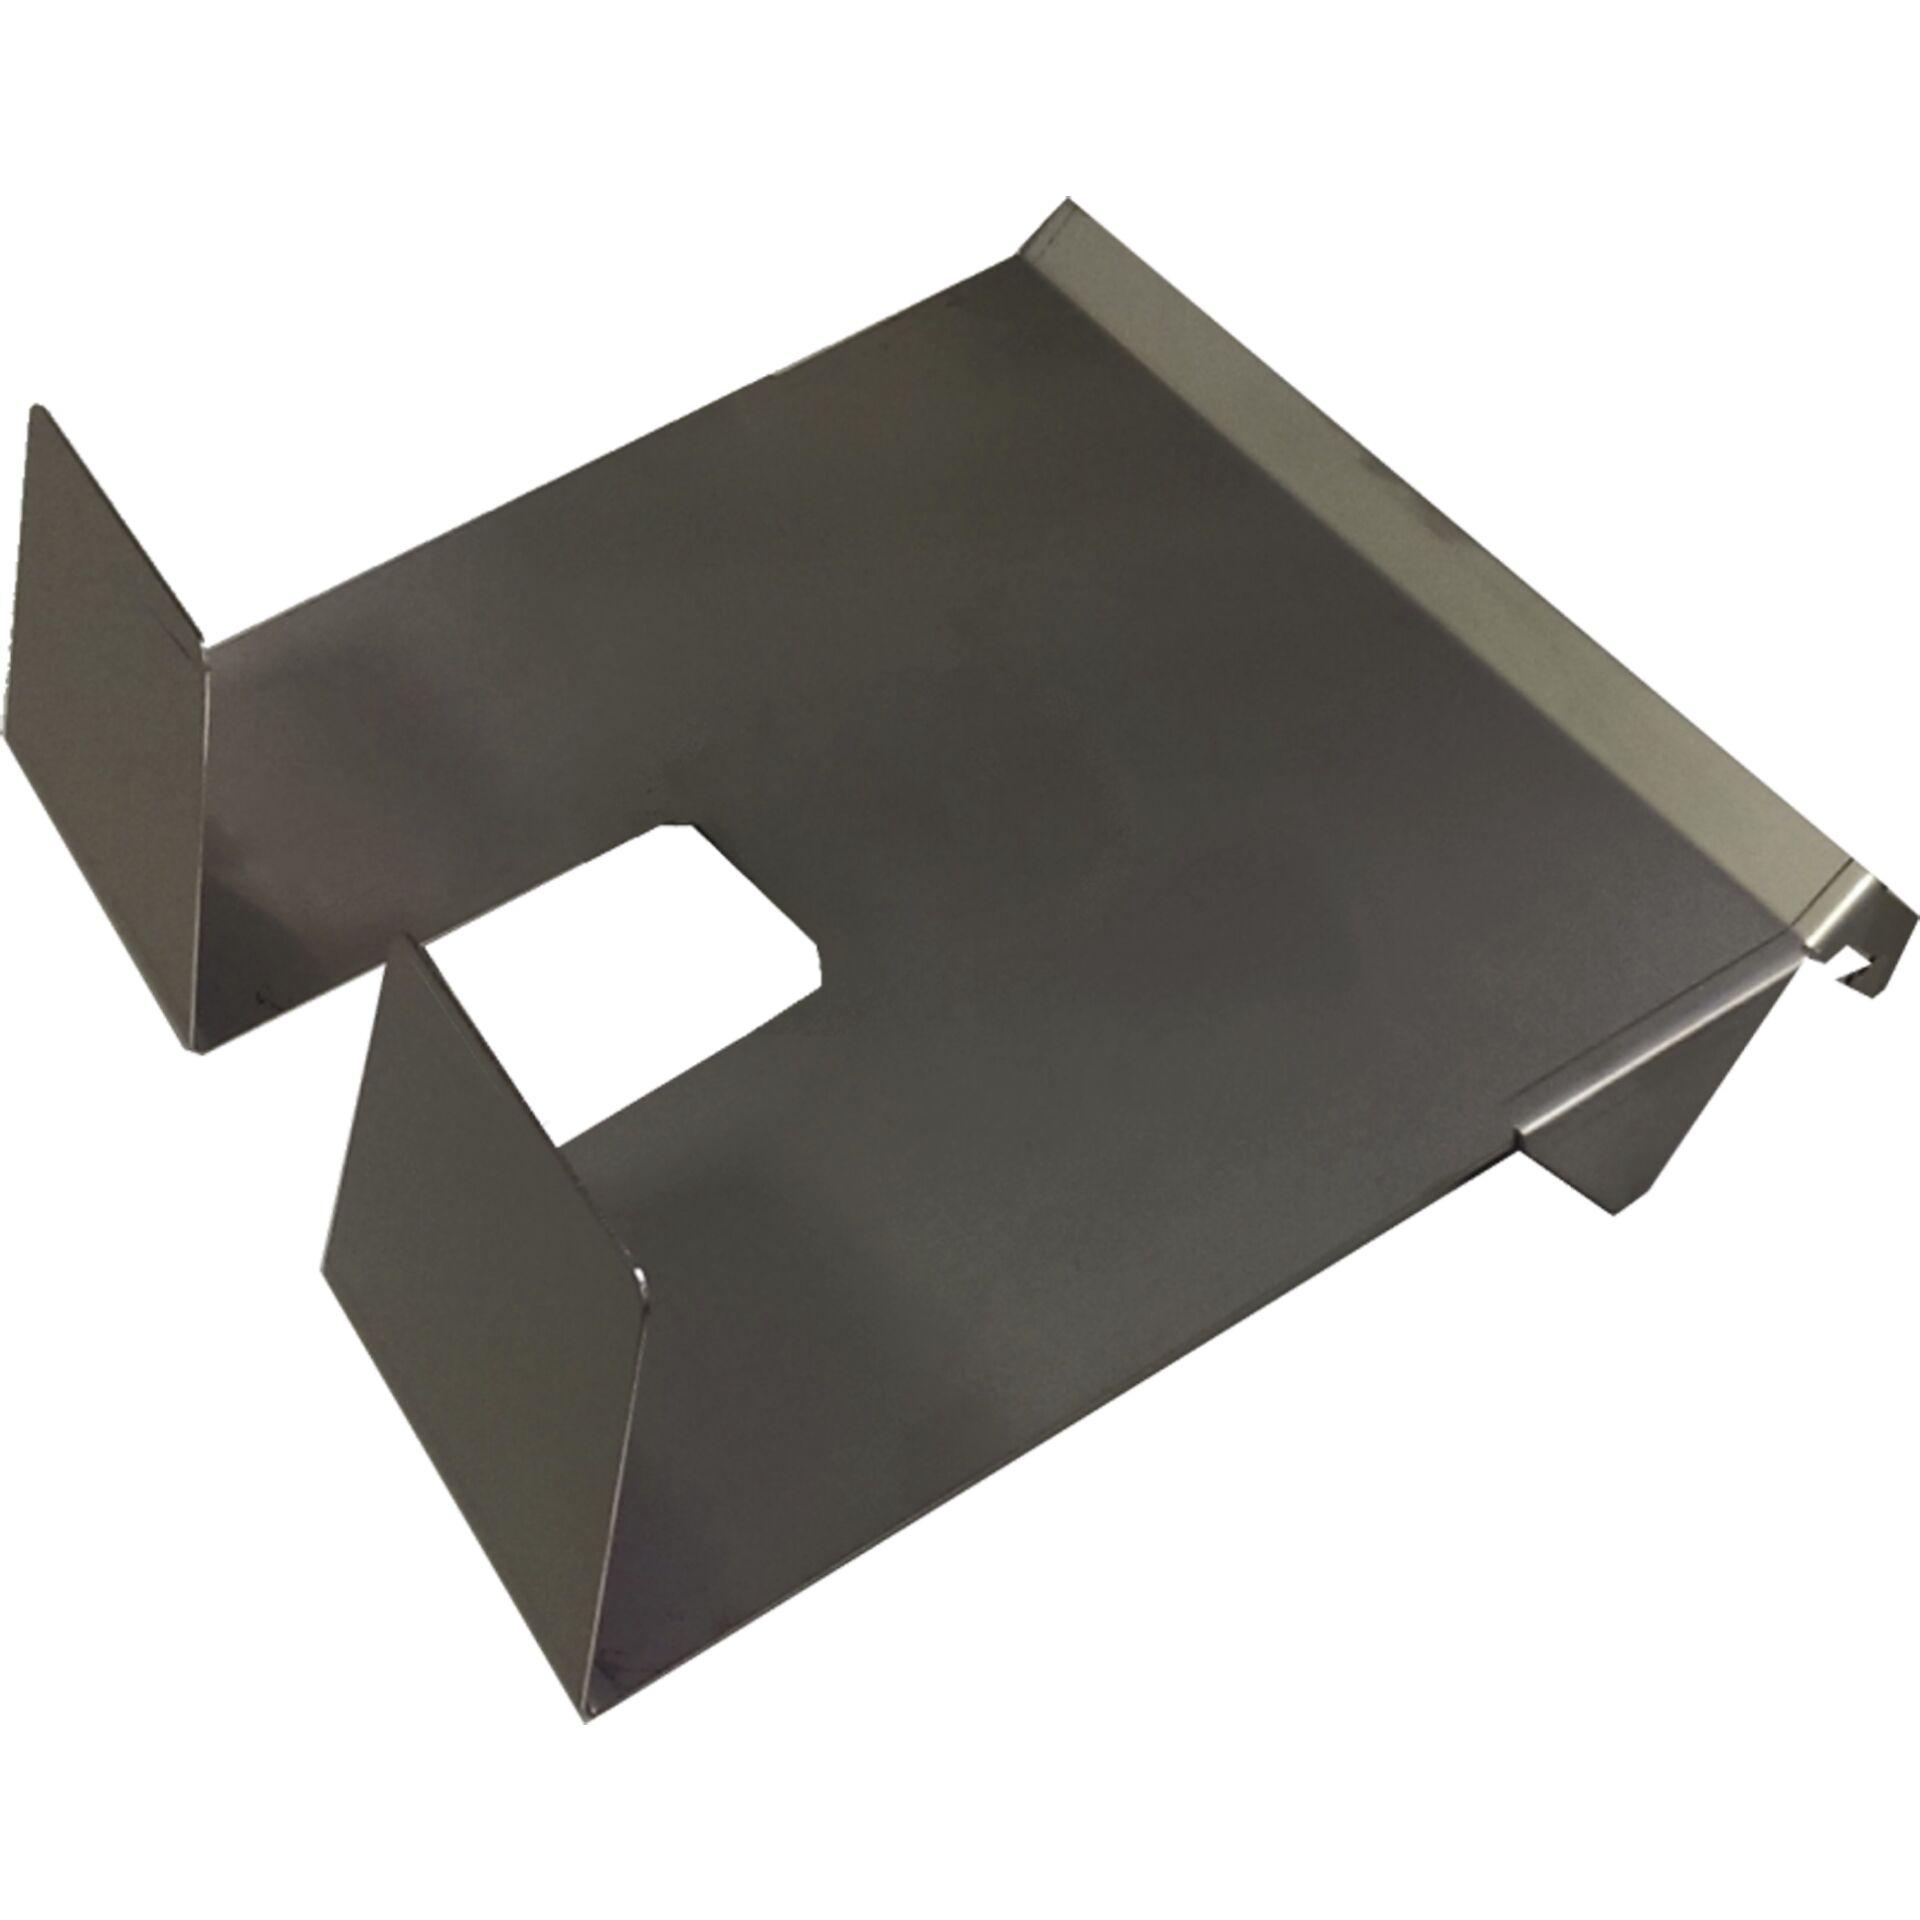 DNP Papertray DS 620 / DP-SL 620 metall schwarz